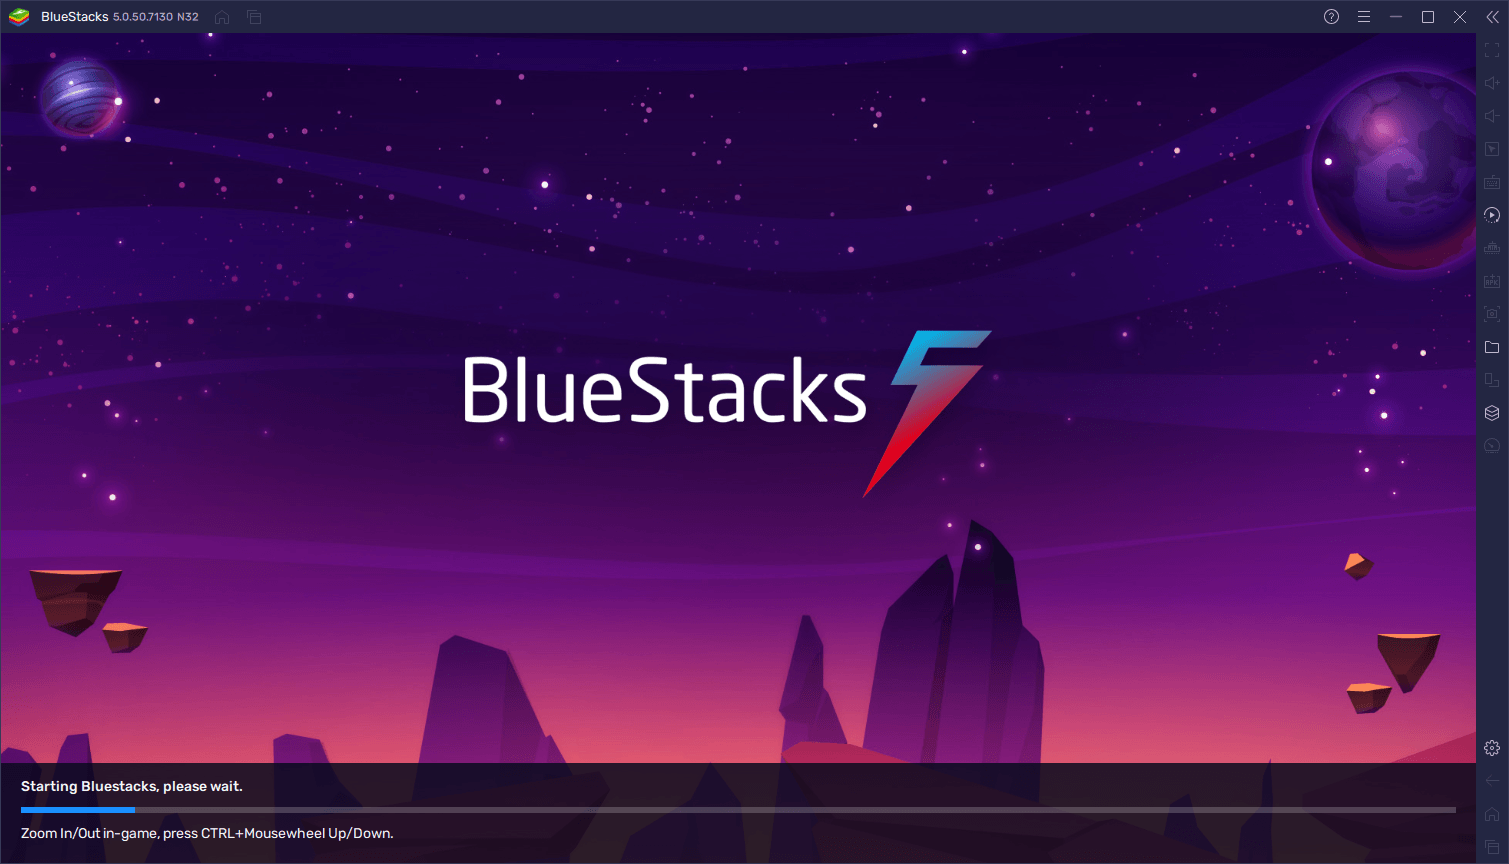 BlueStacks 5記憶體優化功能可確保以盡可能低的RAM使用率實現遊戲的無延遲